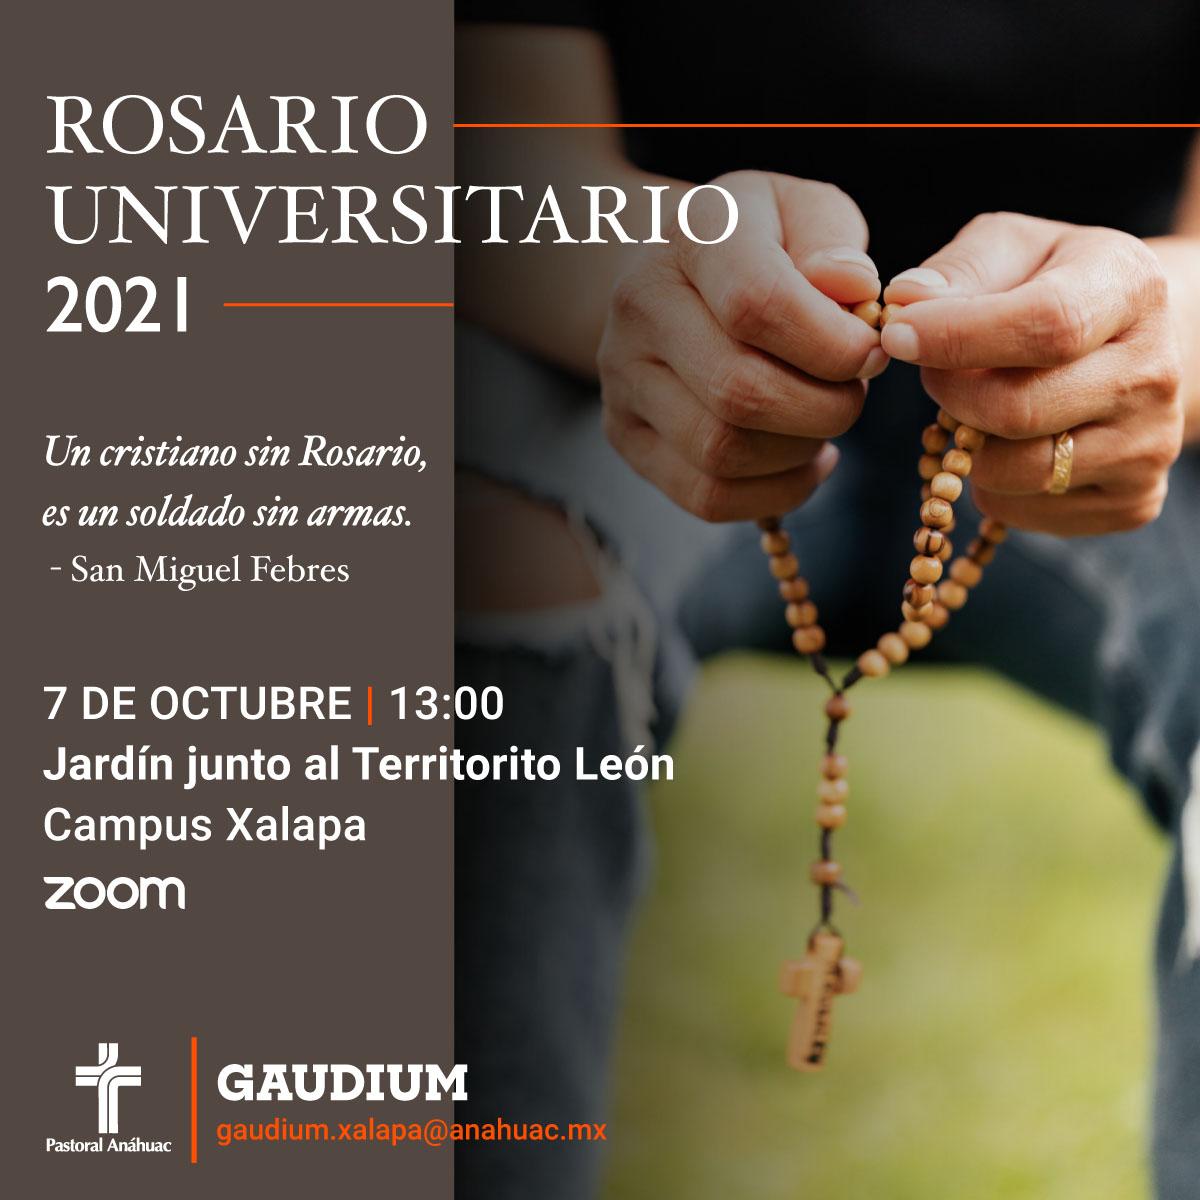 Rosario Universitario